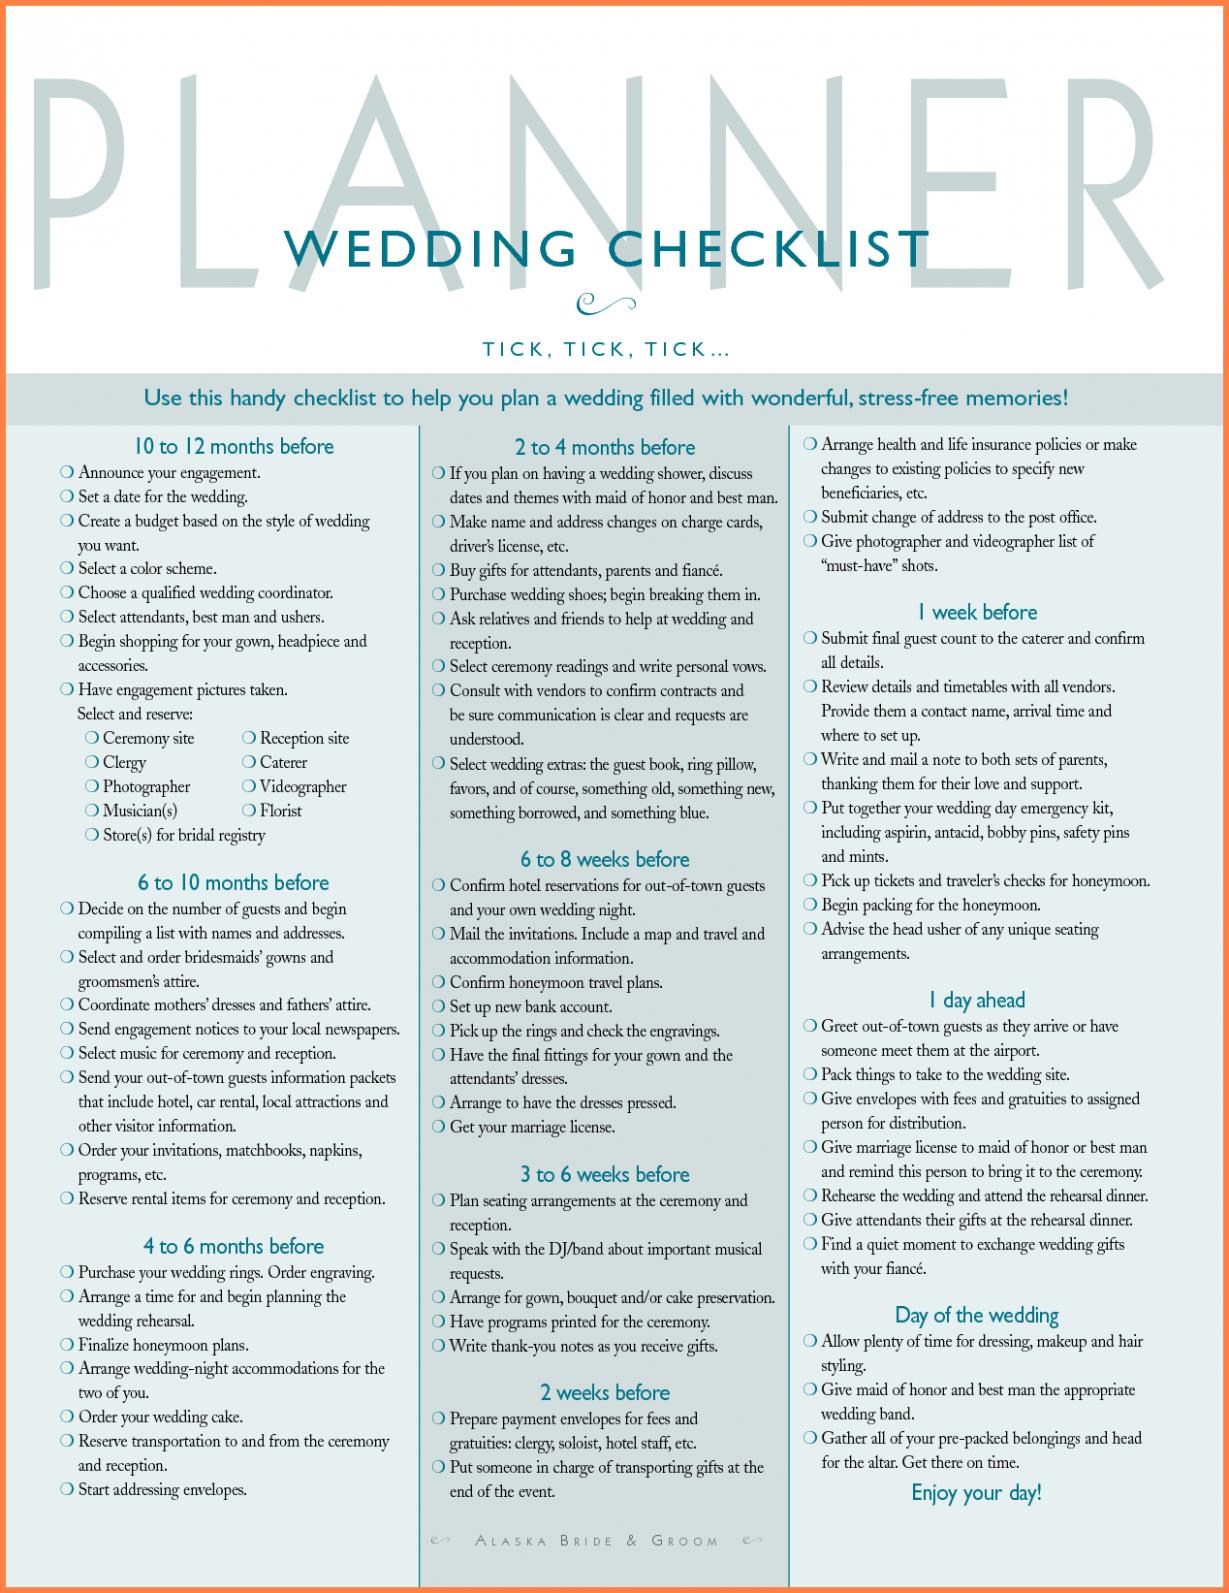 Wedding Checklist Detailed Check Lists Wedding